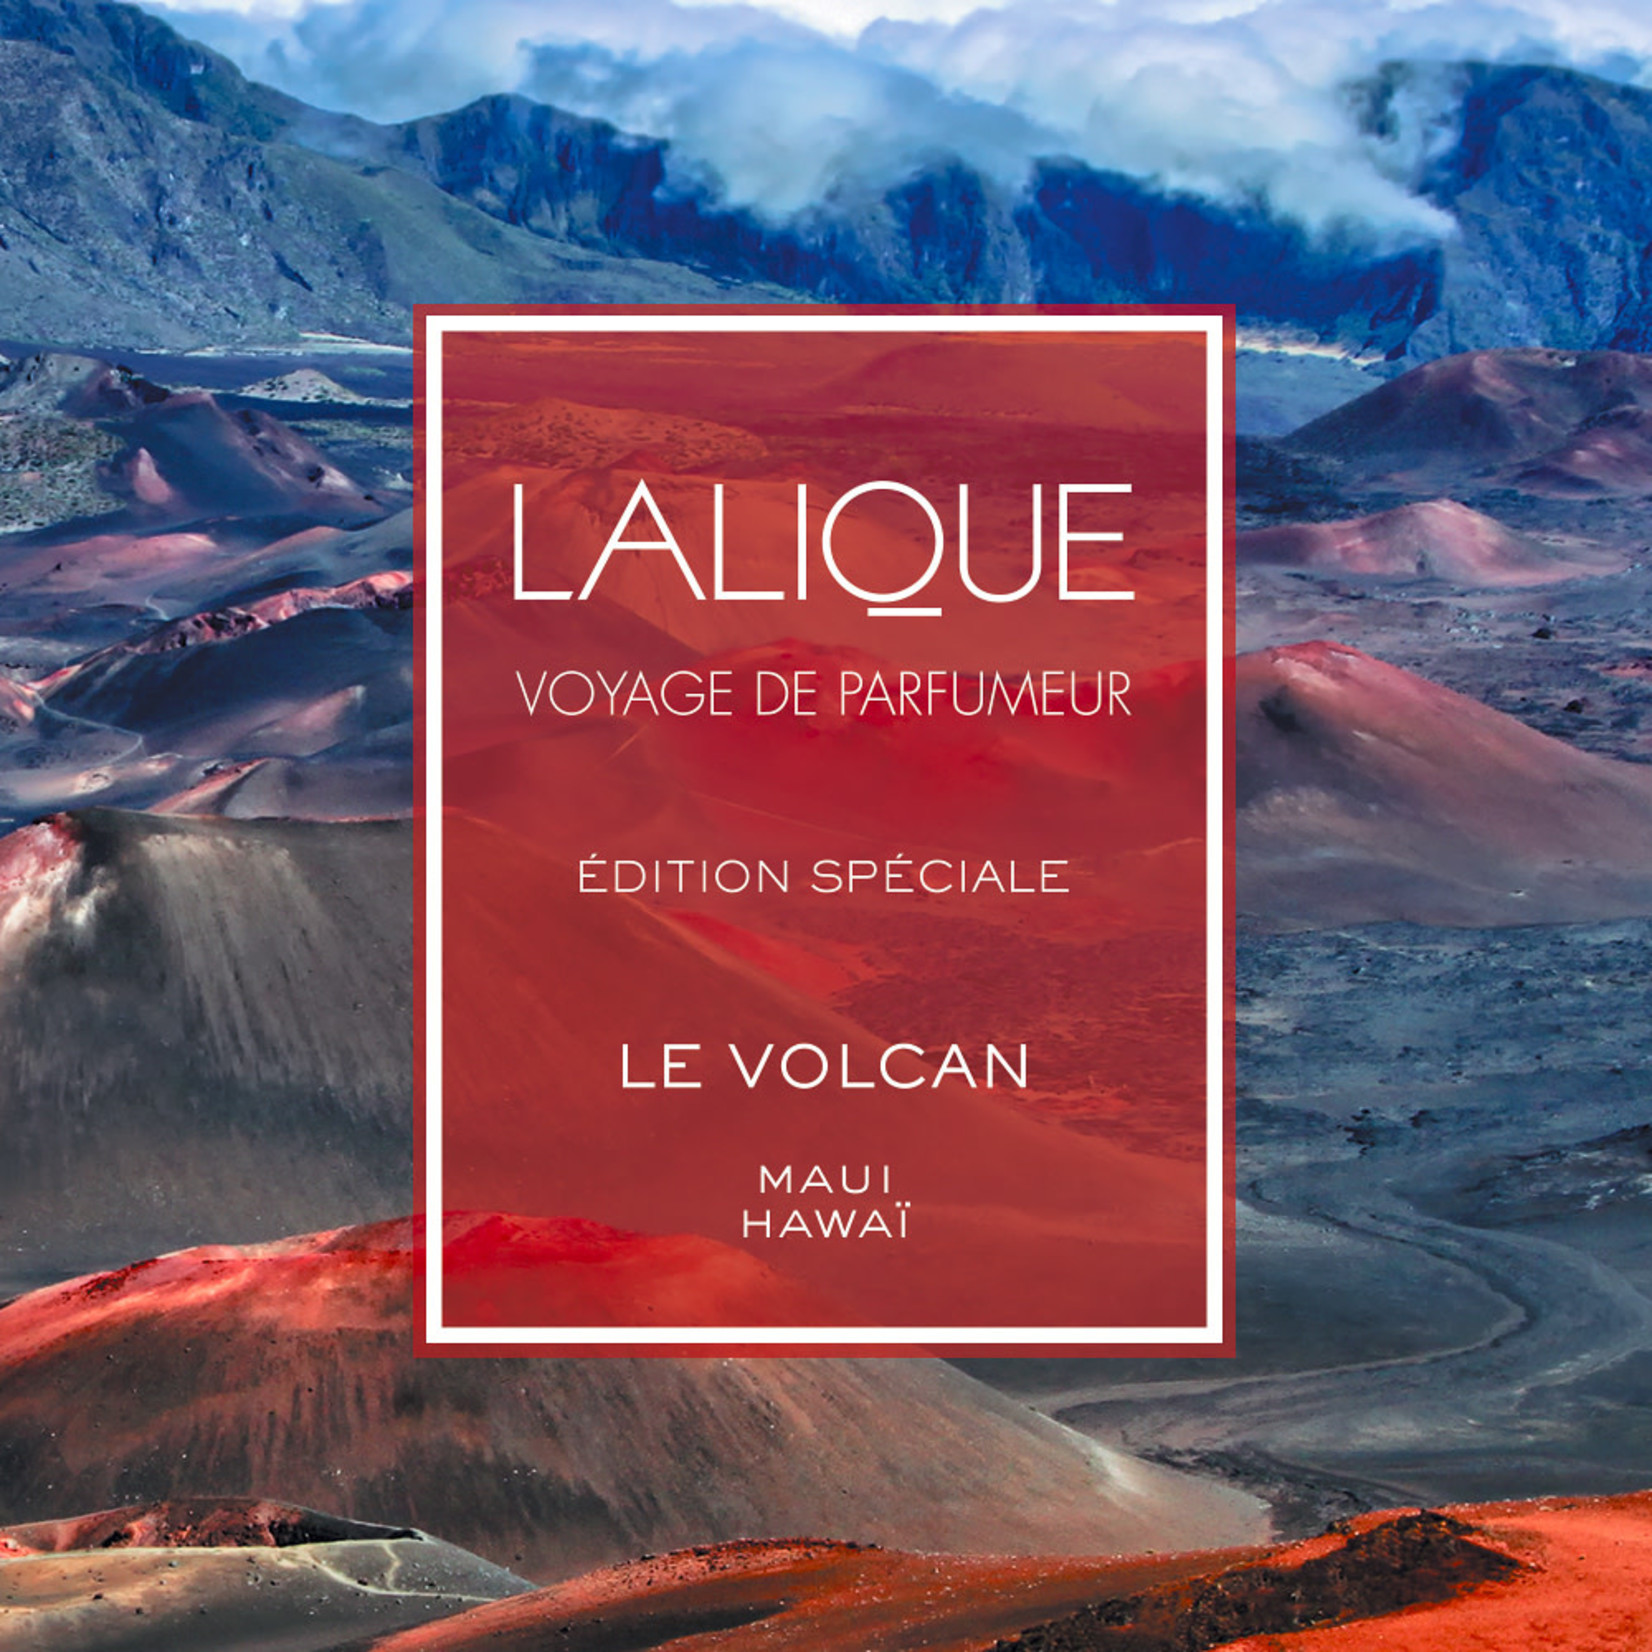 Lalique Volcan